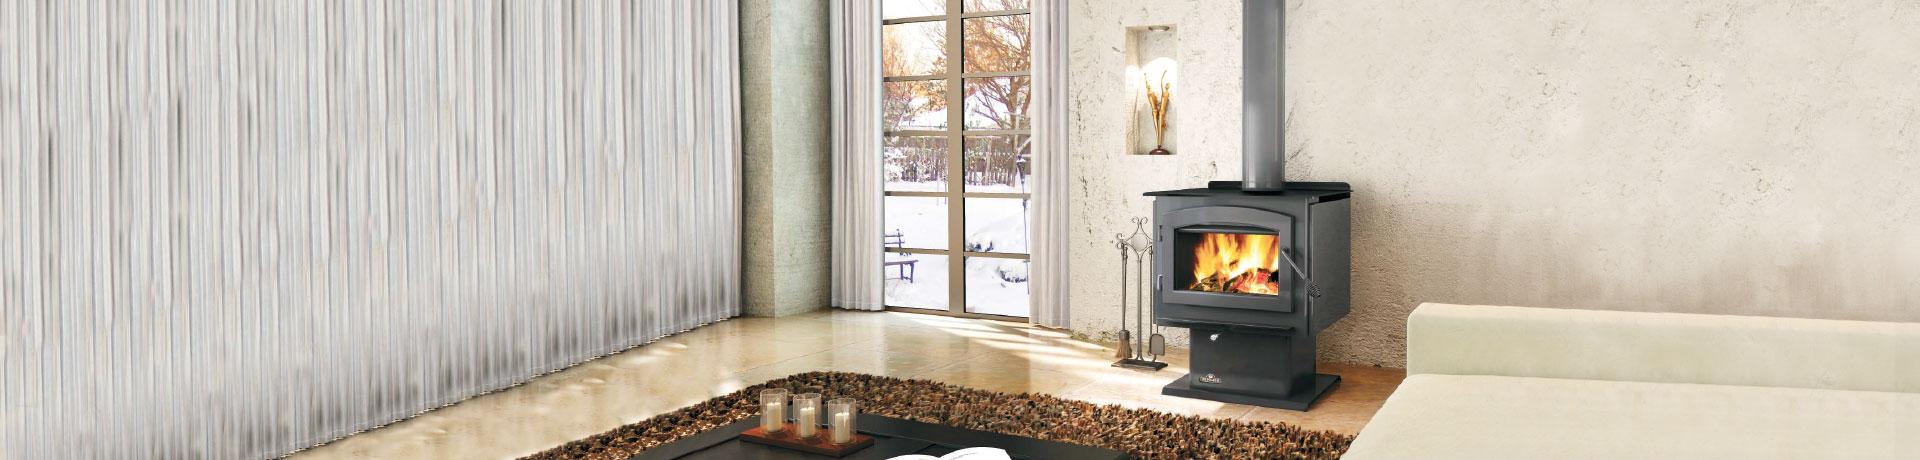 ibuyfireplaces com buy fireplace equipment fireplace